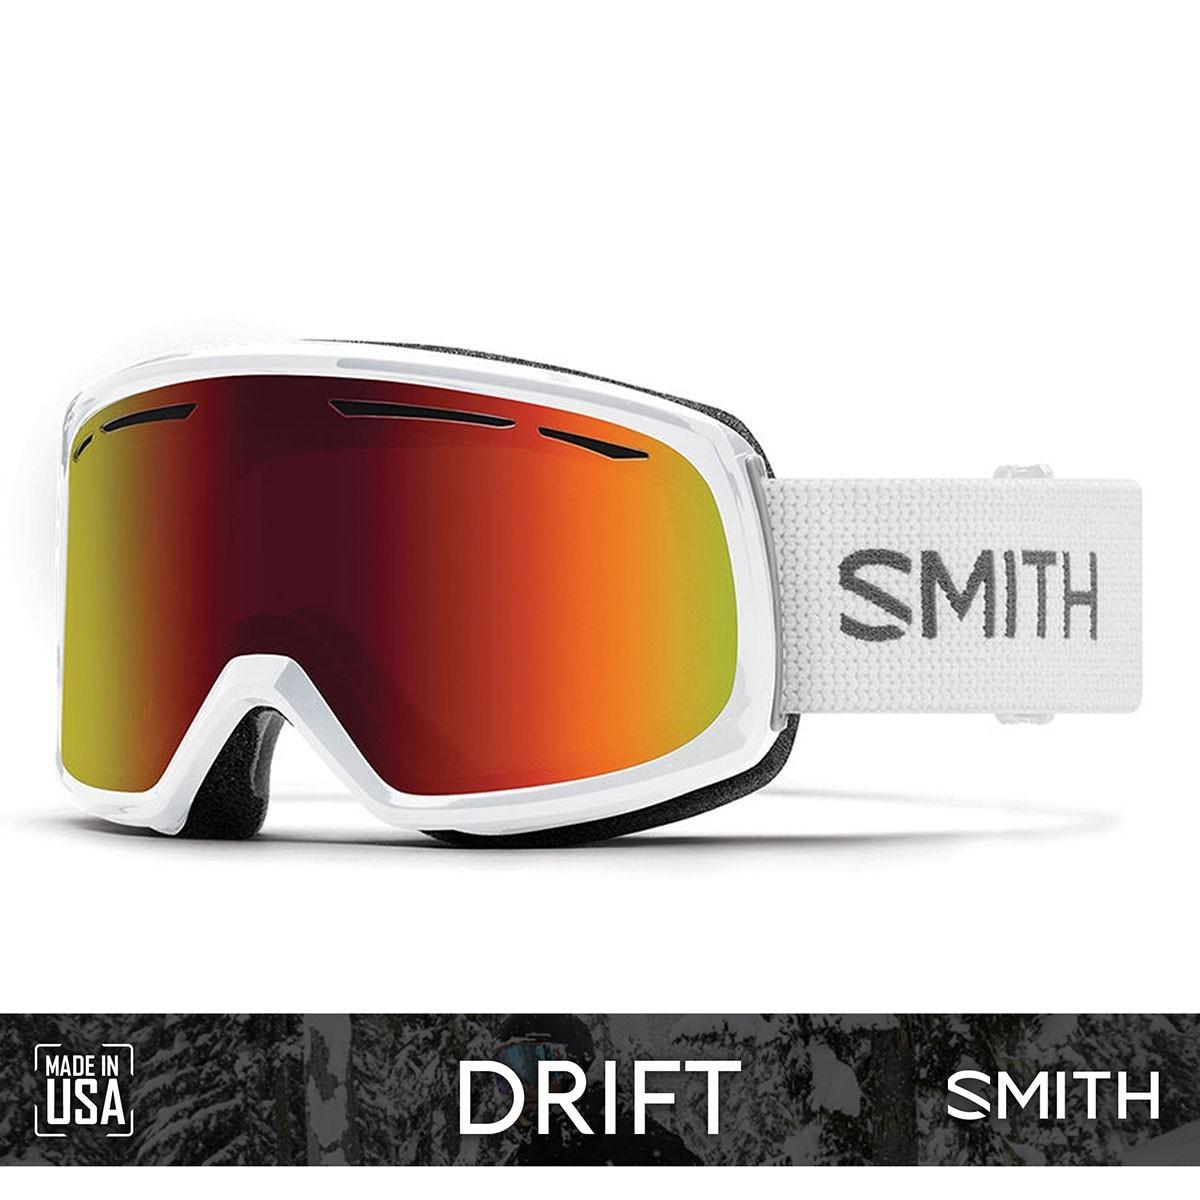 SMITH DRIFT White | S3 RED SOL-X Mirror - Изображение - AQUAMATRIX